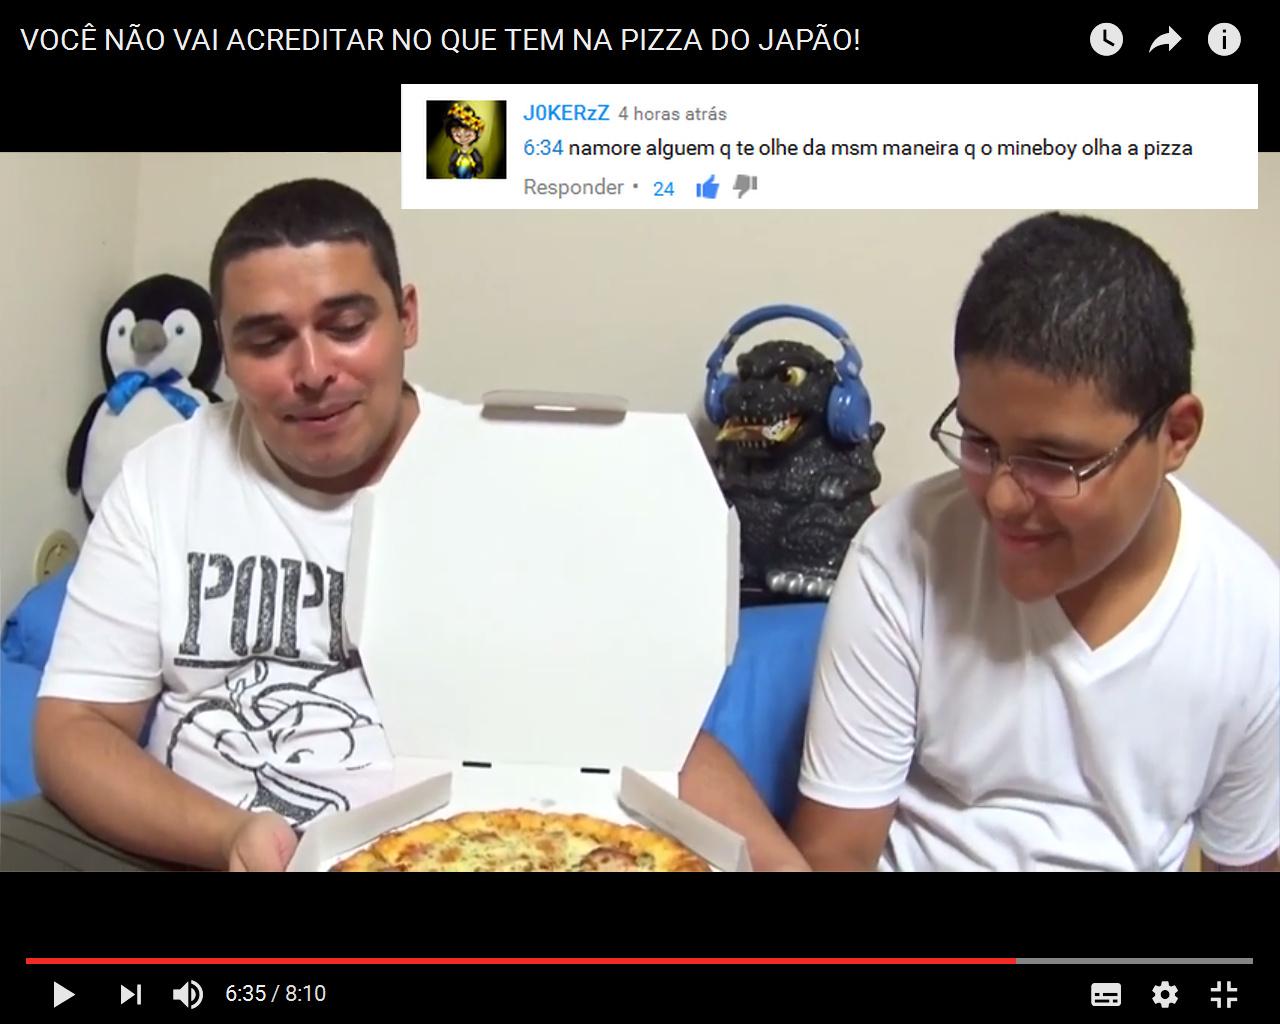 Mineboy pizzeiro - meme